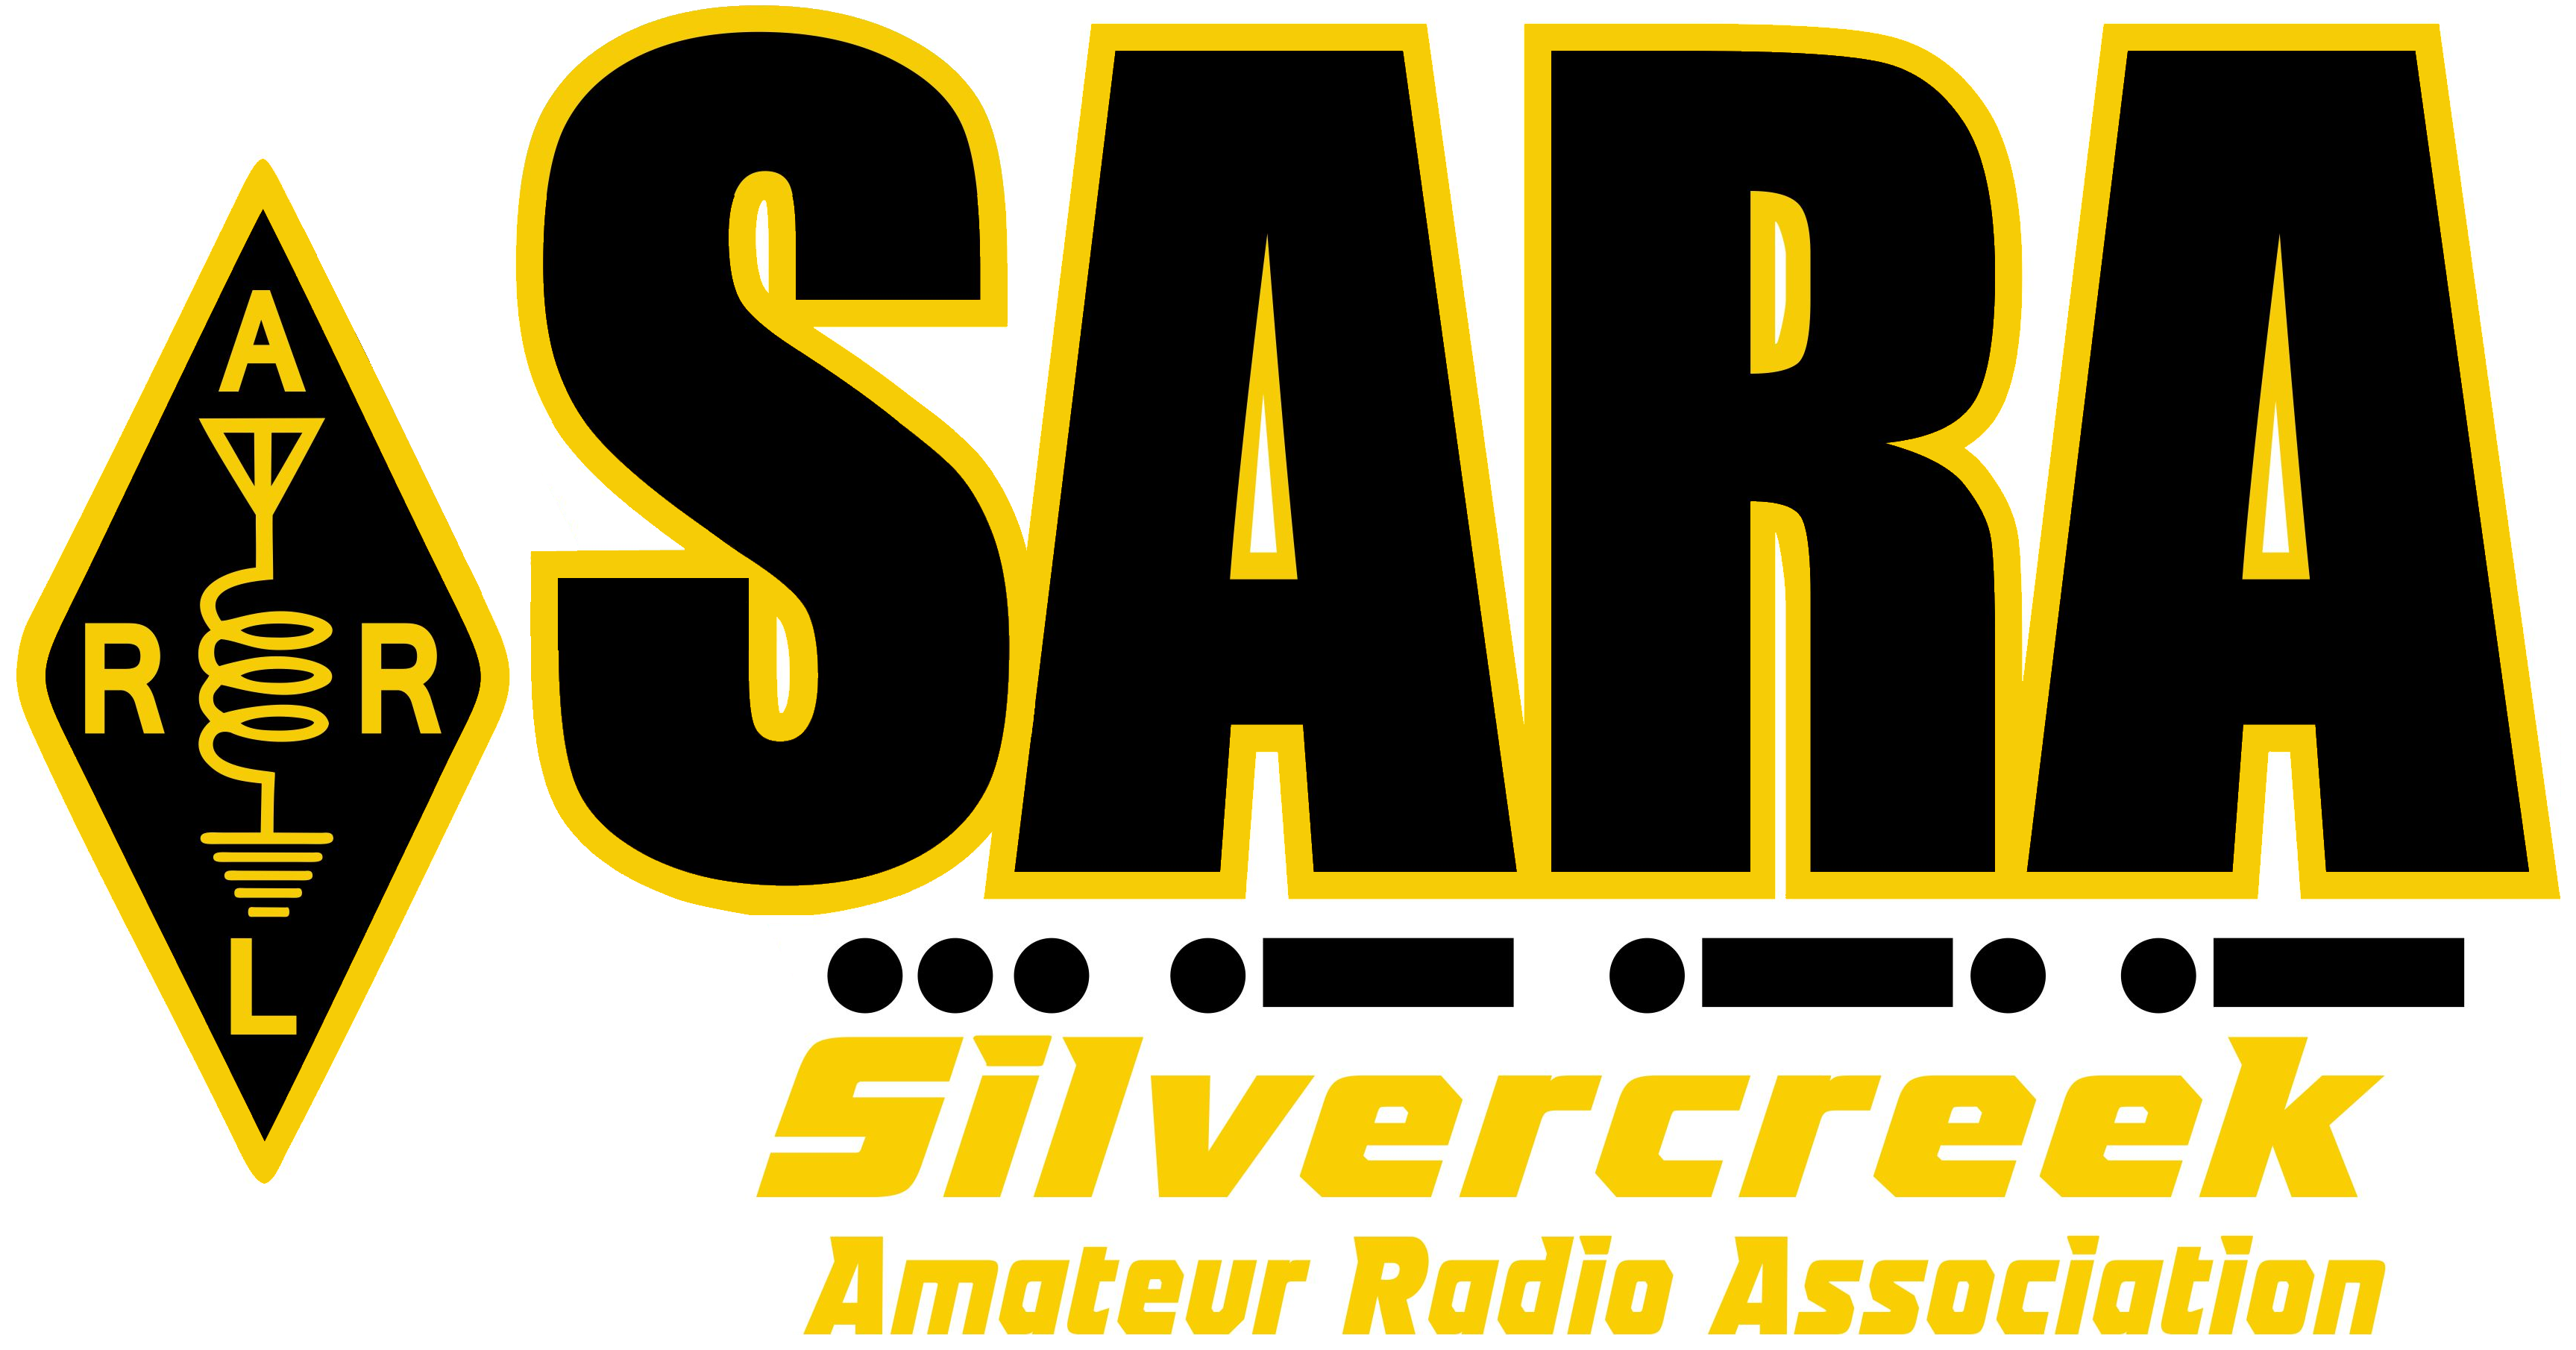 SARA Branding and Images.